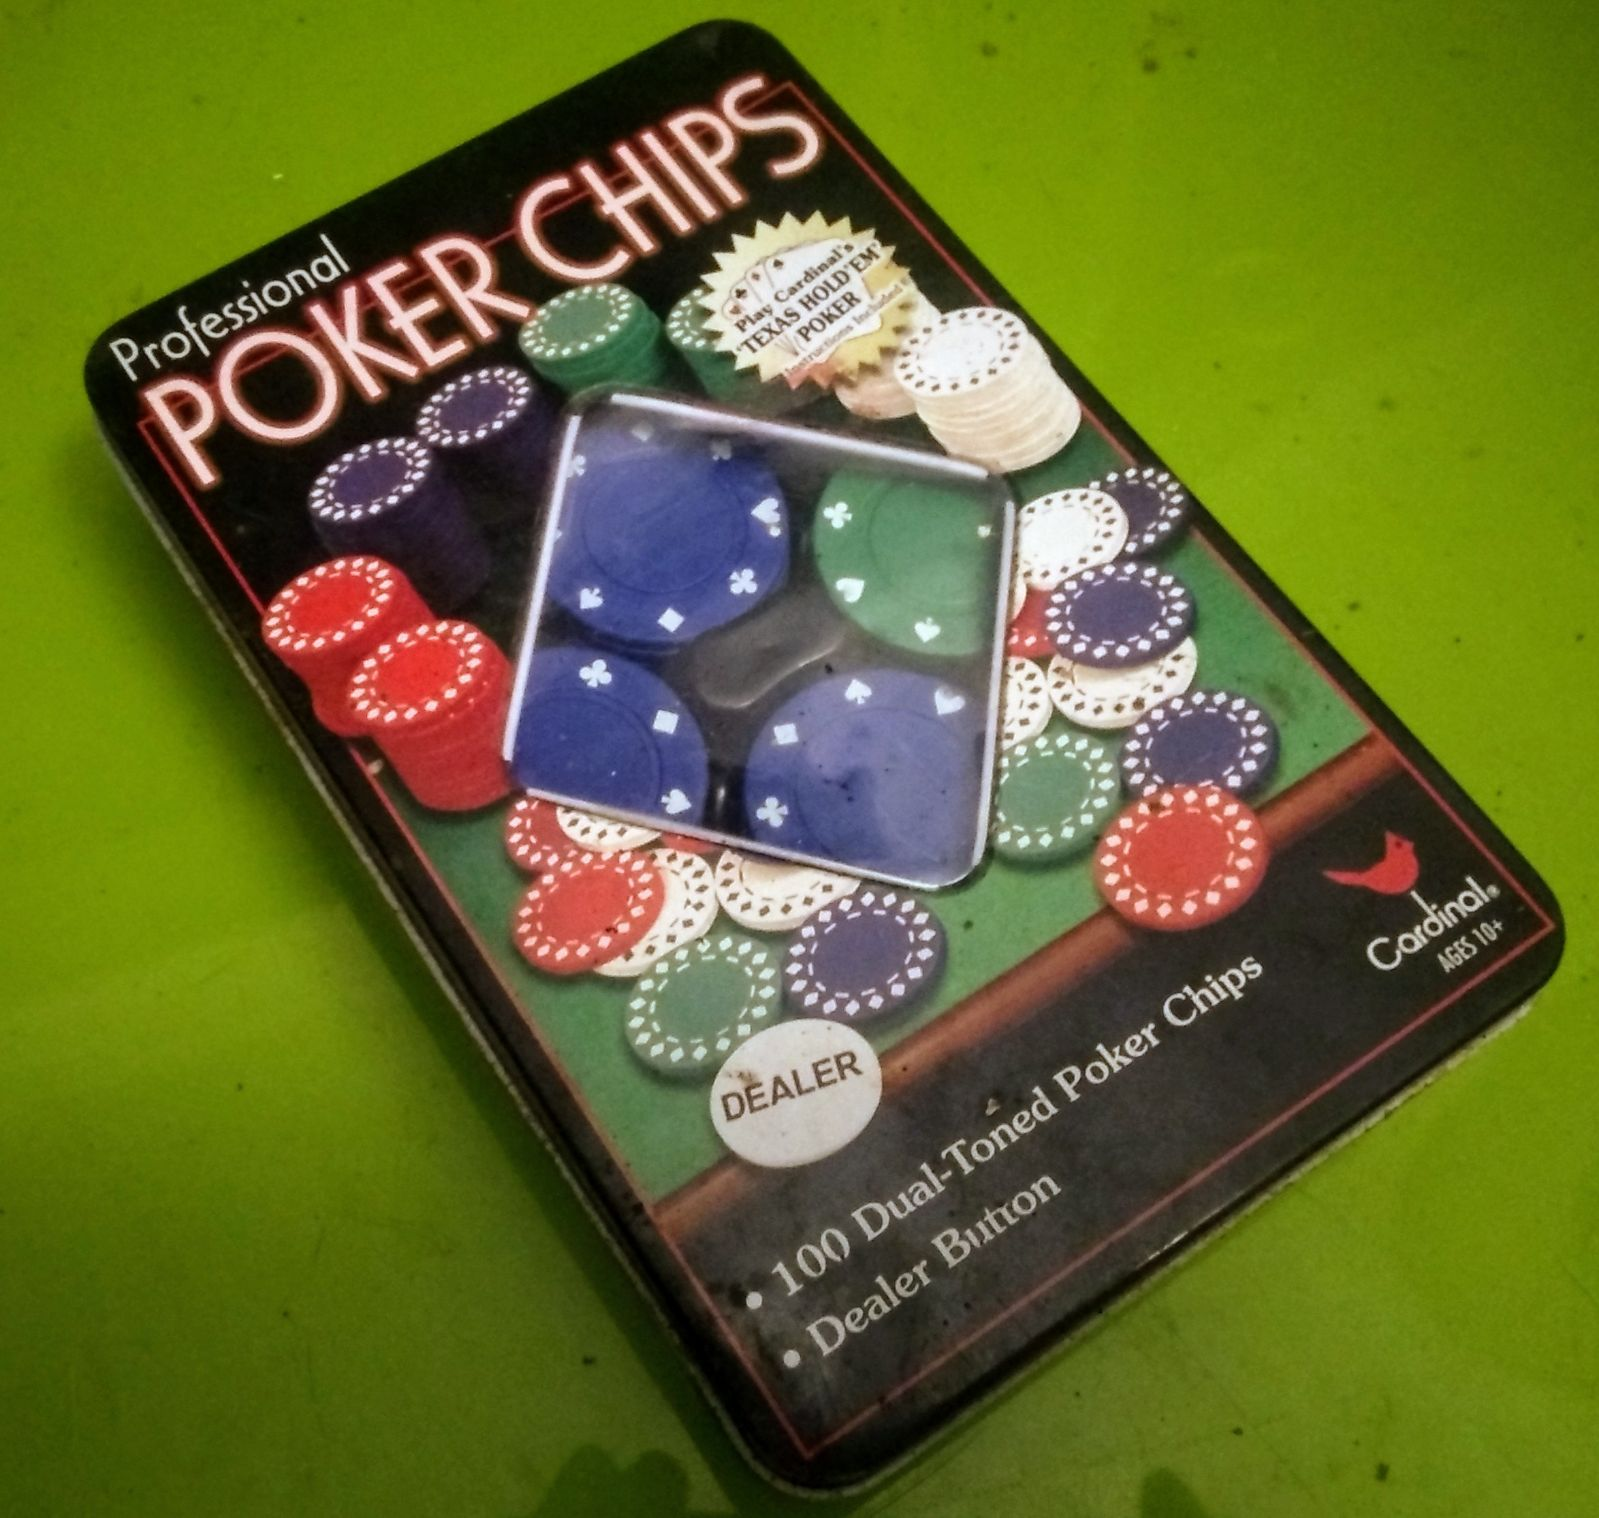 Set of Professional Poker Chips